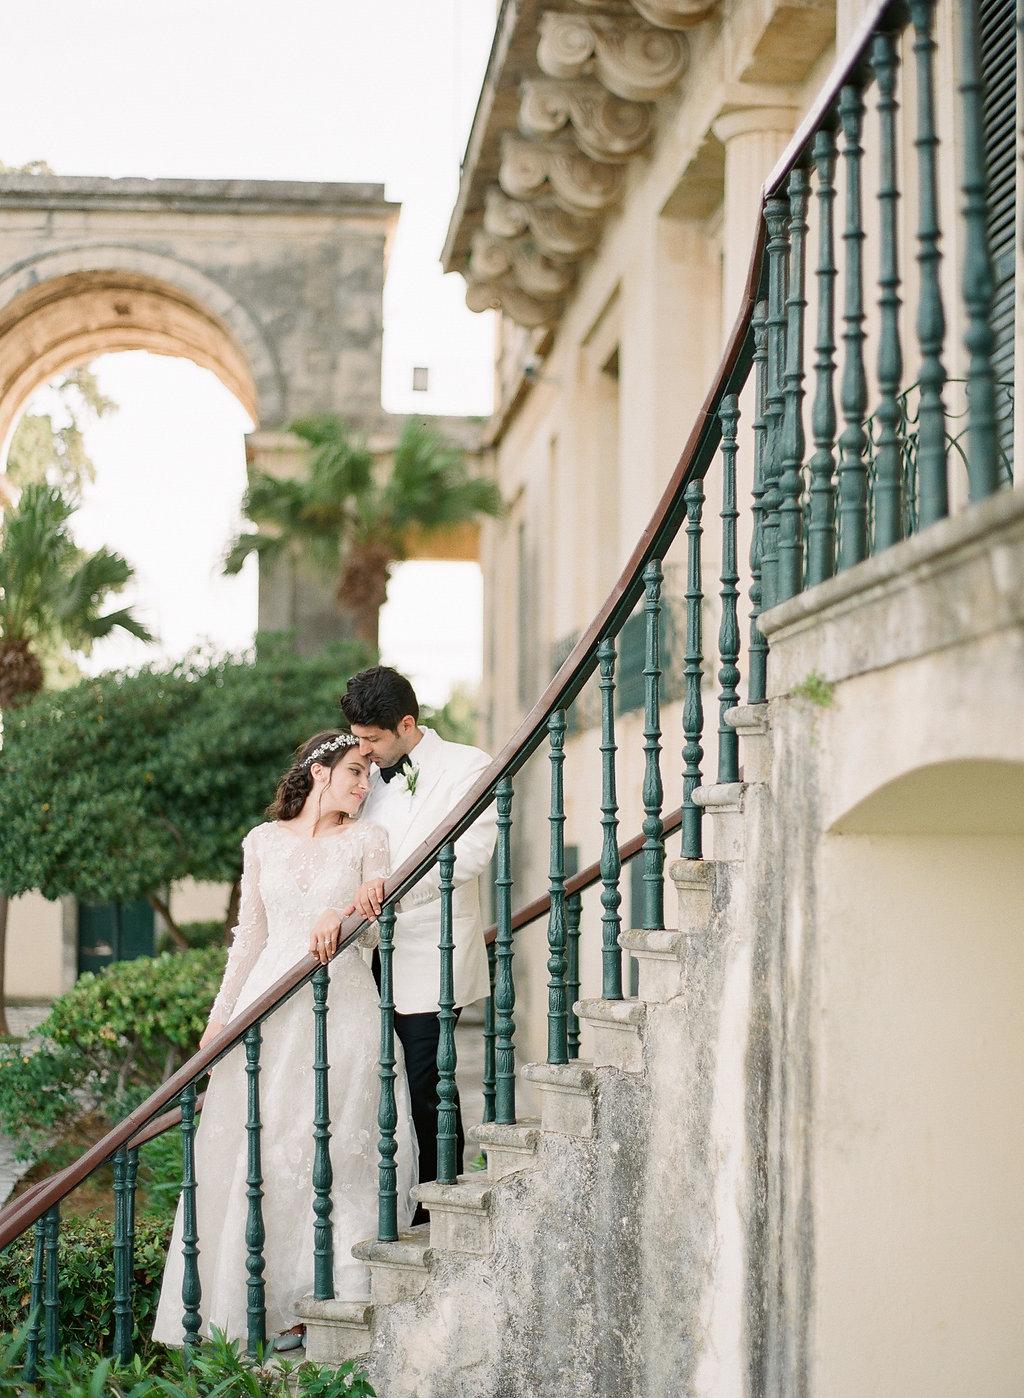 Corfu Island Wedding with Elegant and Romantic Details | Les Anagnou | Greece photographer, fine art film Greece photographer